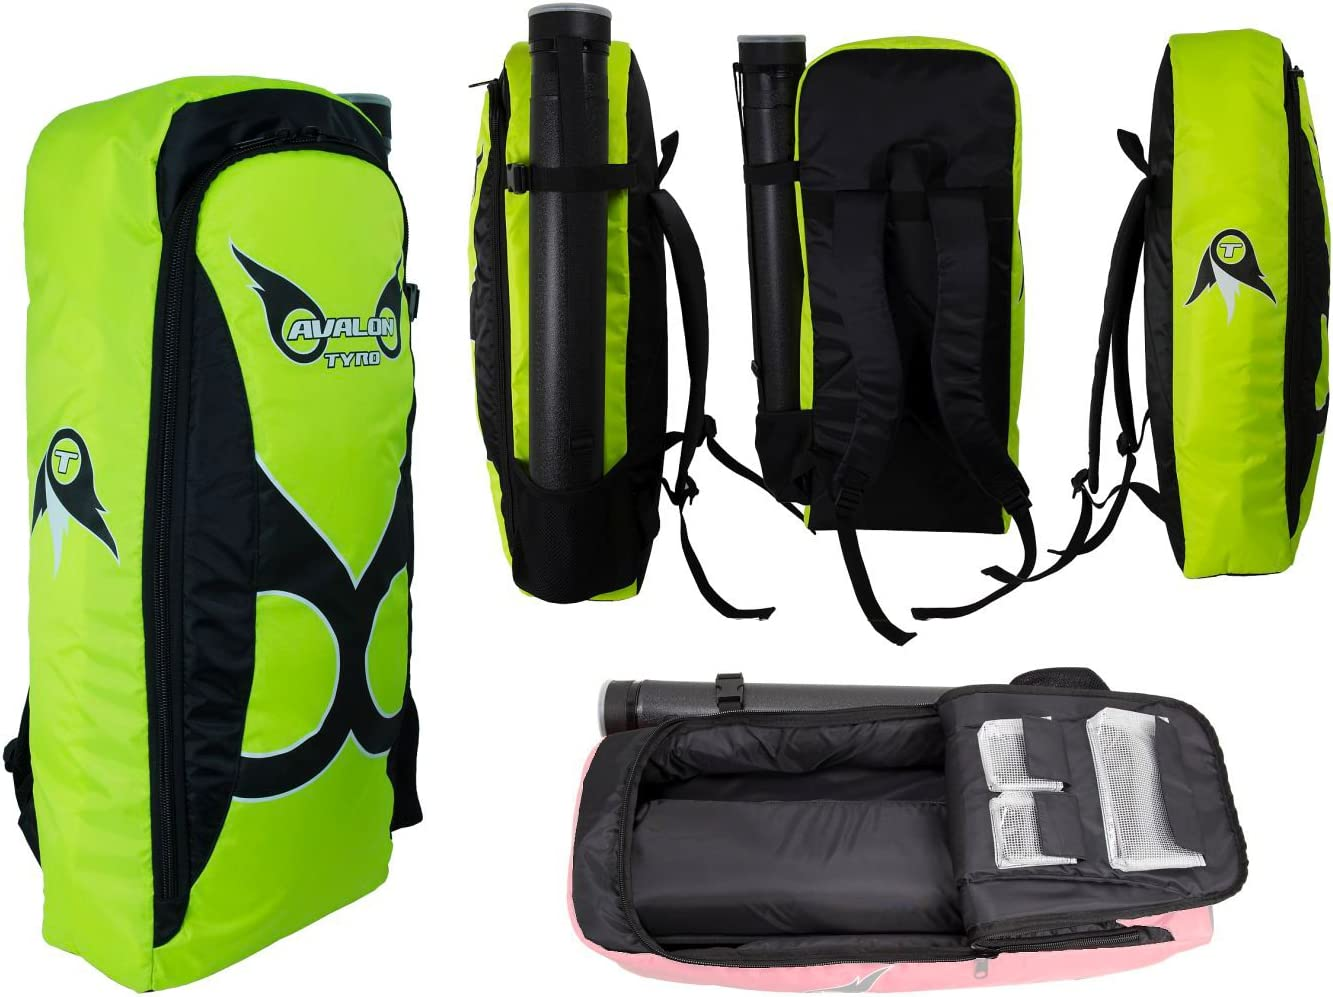 Avalon Archery Tyro W Take Down Recurve Bow Back Pack Carry Case Bag